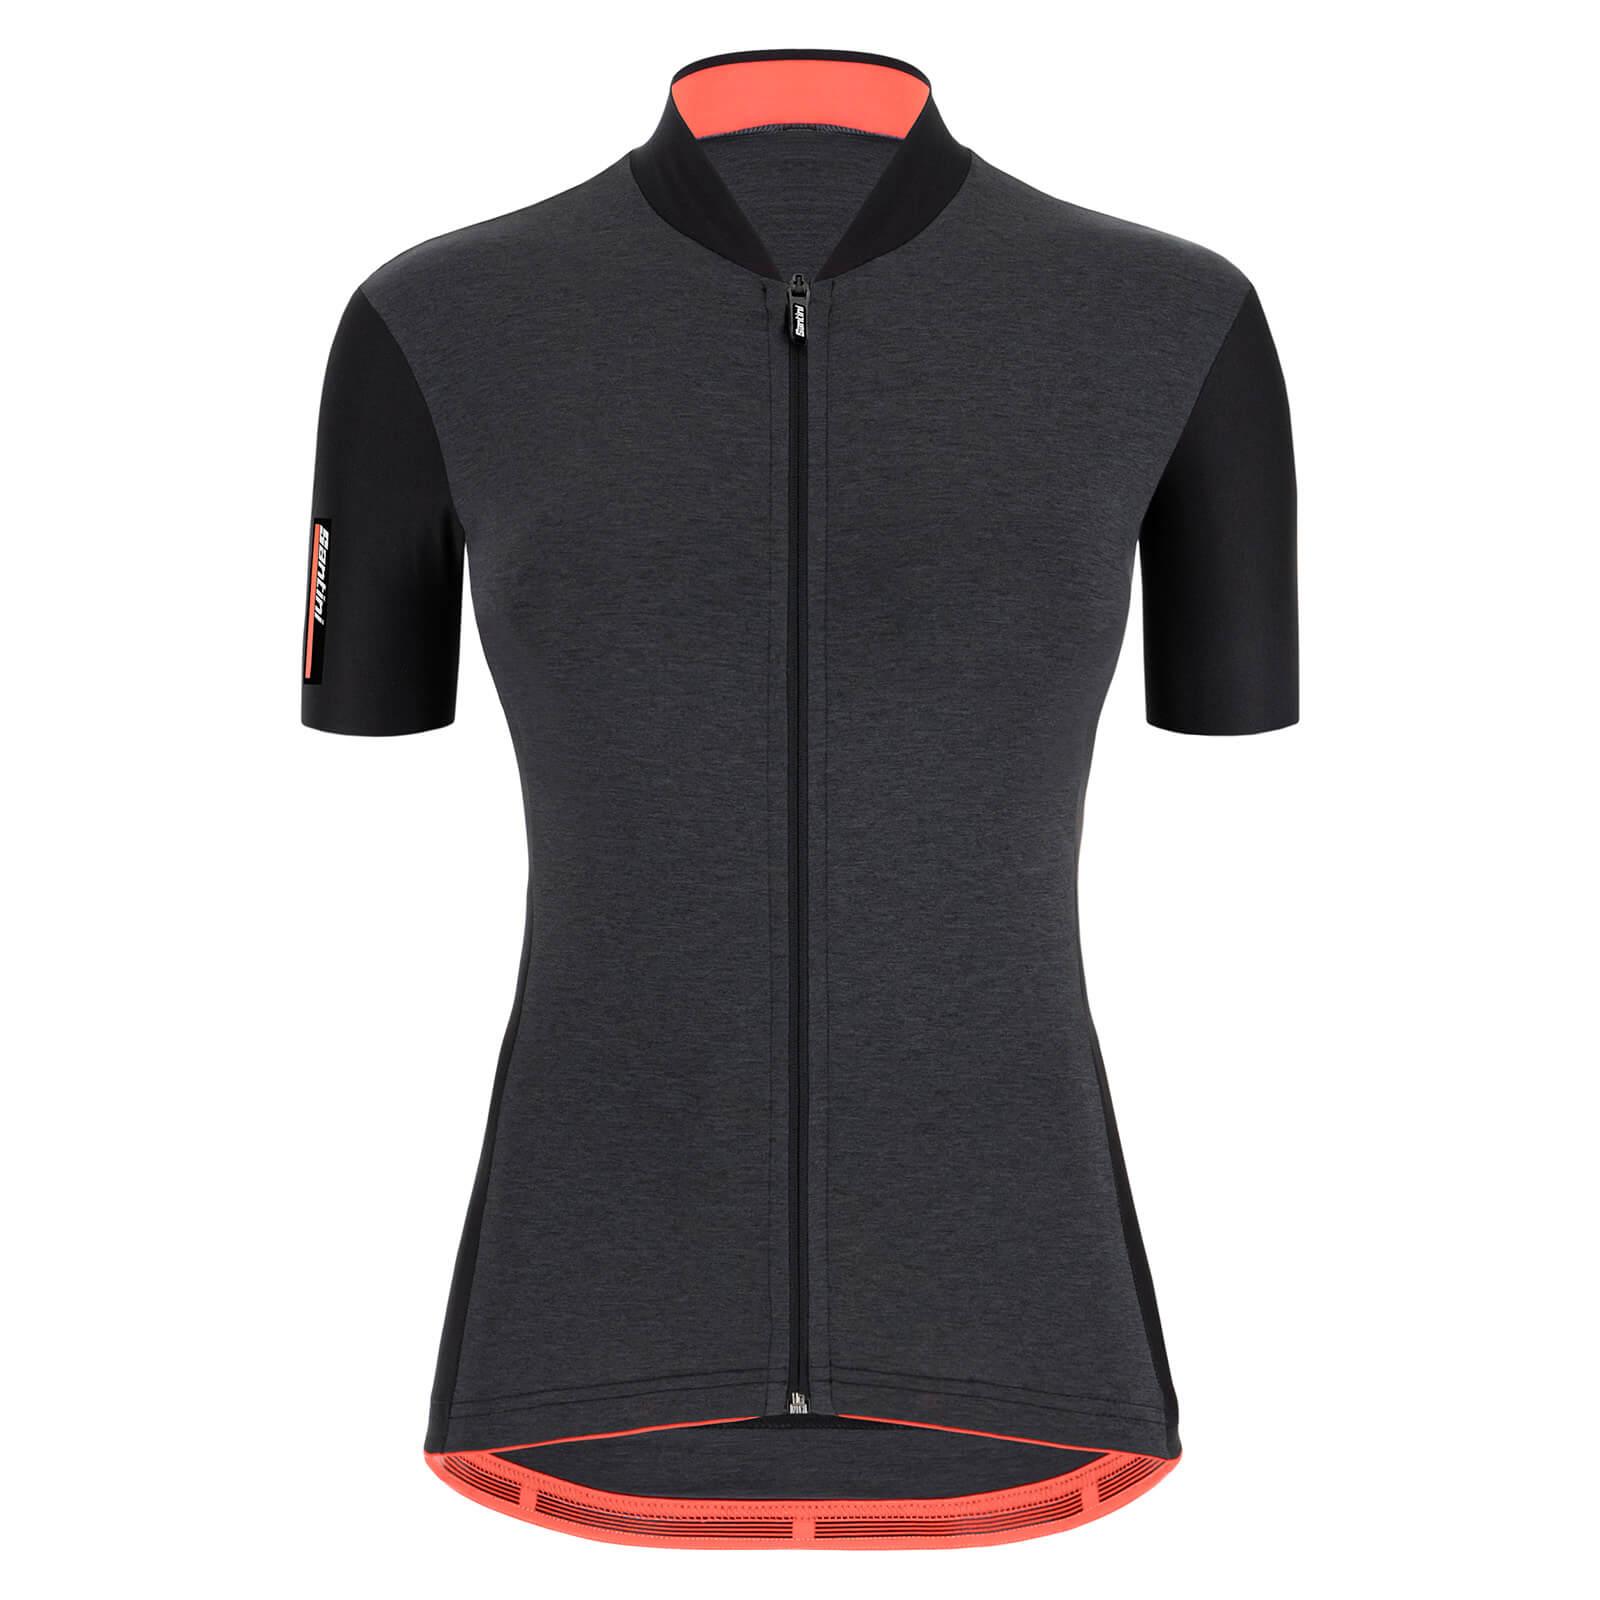 Santini Women's Colore Jersey - L - Black